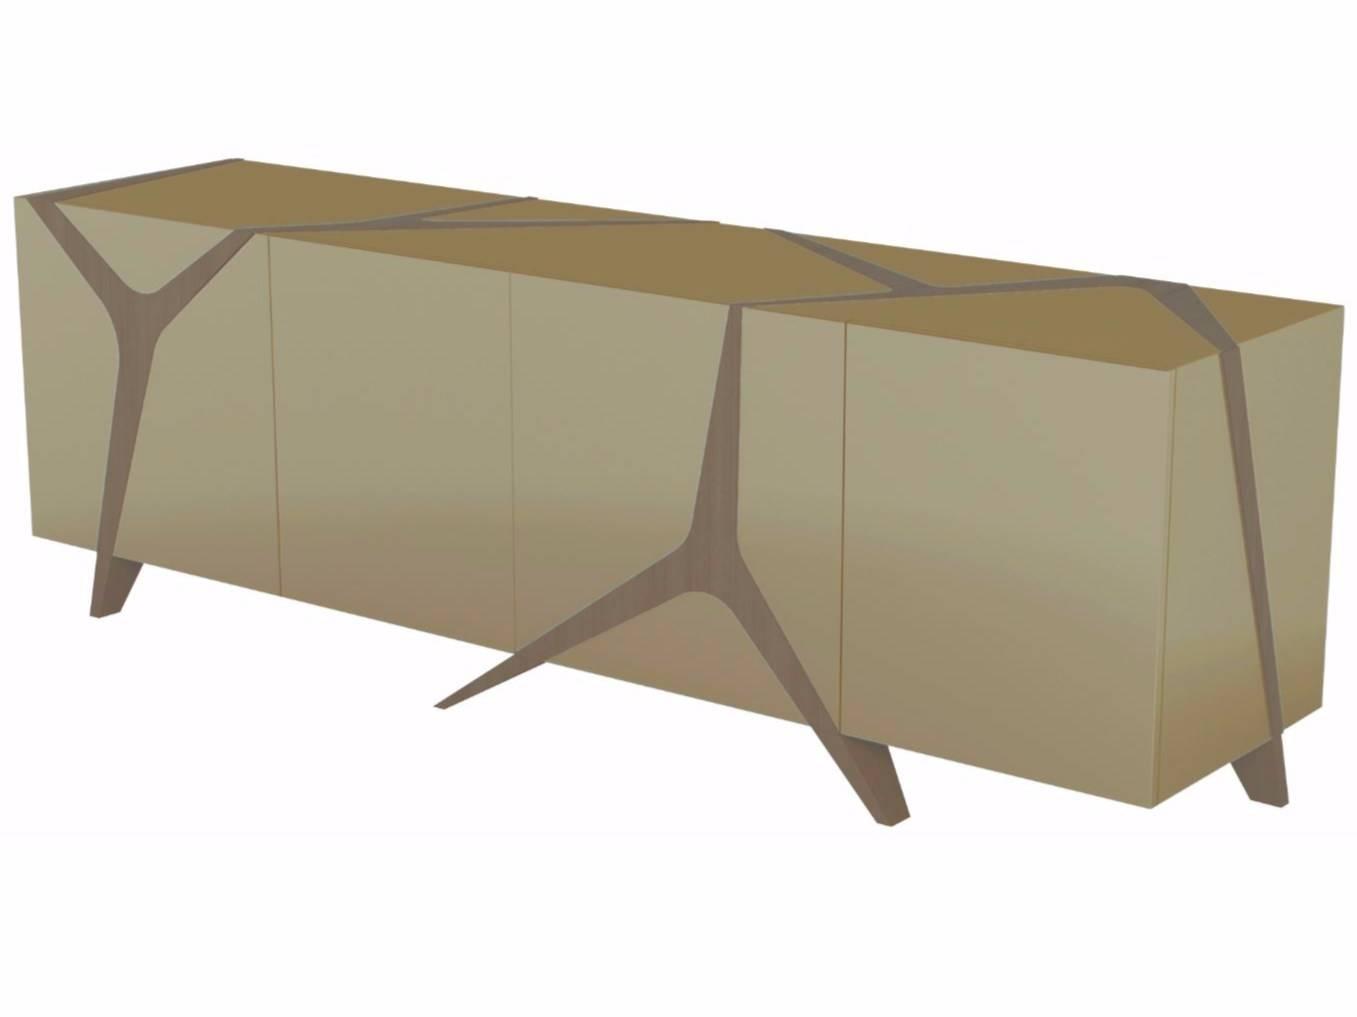 Rosace | Sideboard Les Contemporains Collectionroche Bobois Regarding Latest Roche Bobois Sideboards (#13 of 15)